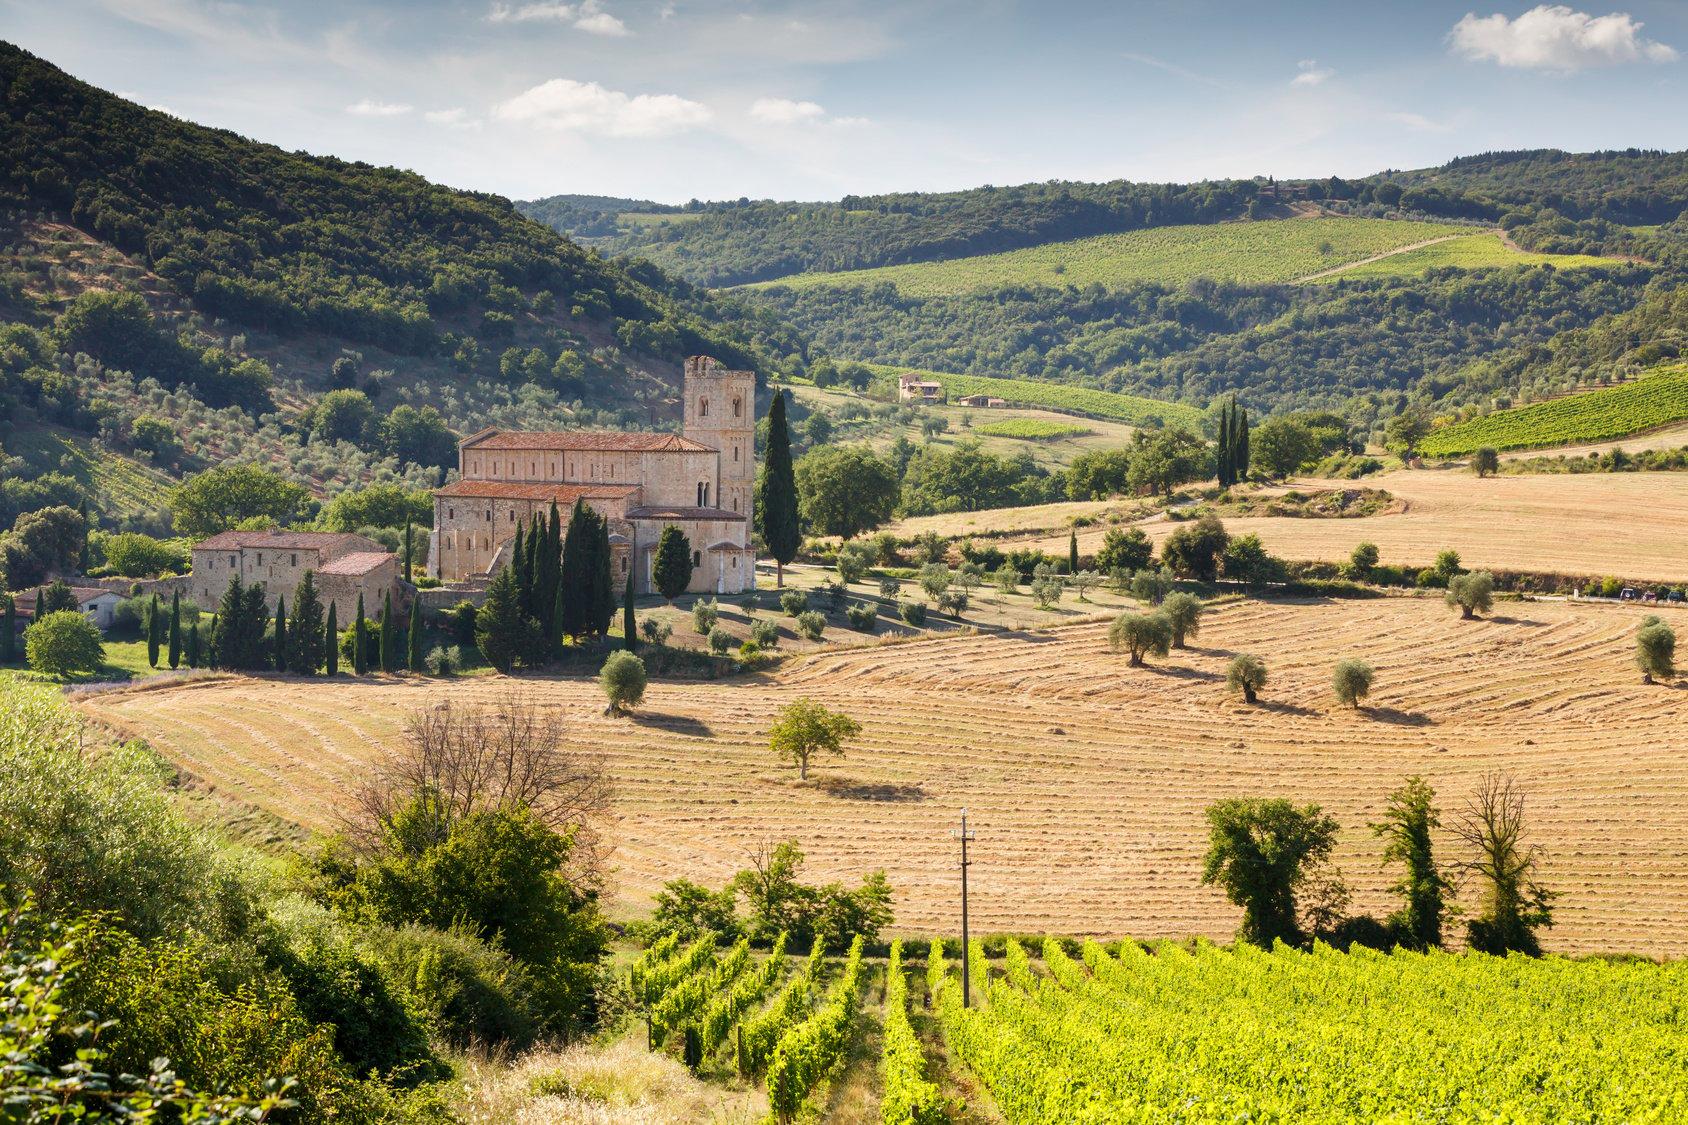 Sant'Antimo Tuscany Tourissimo hiking tour